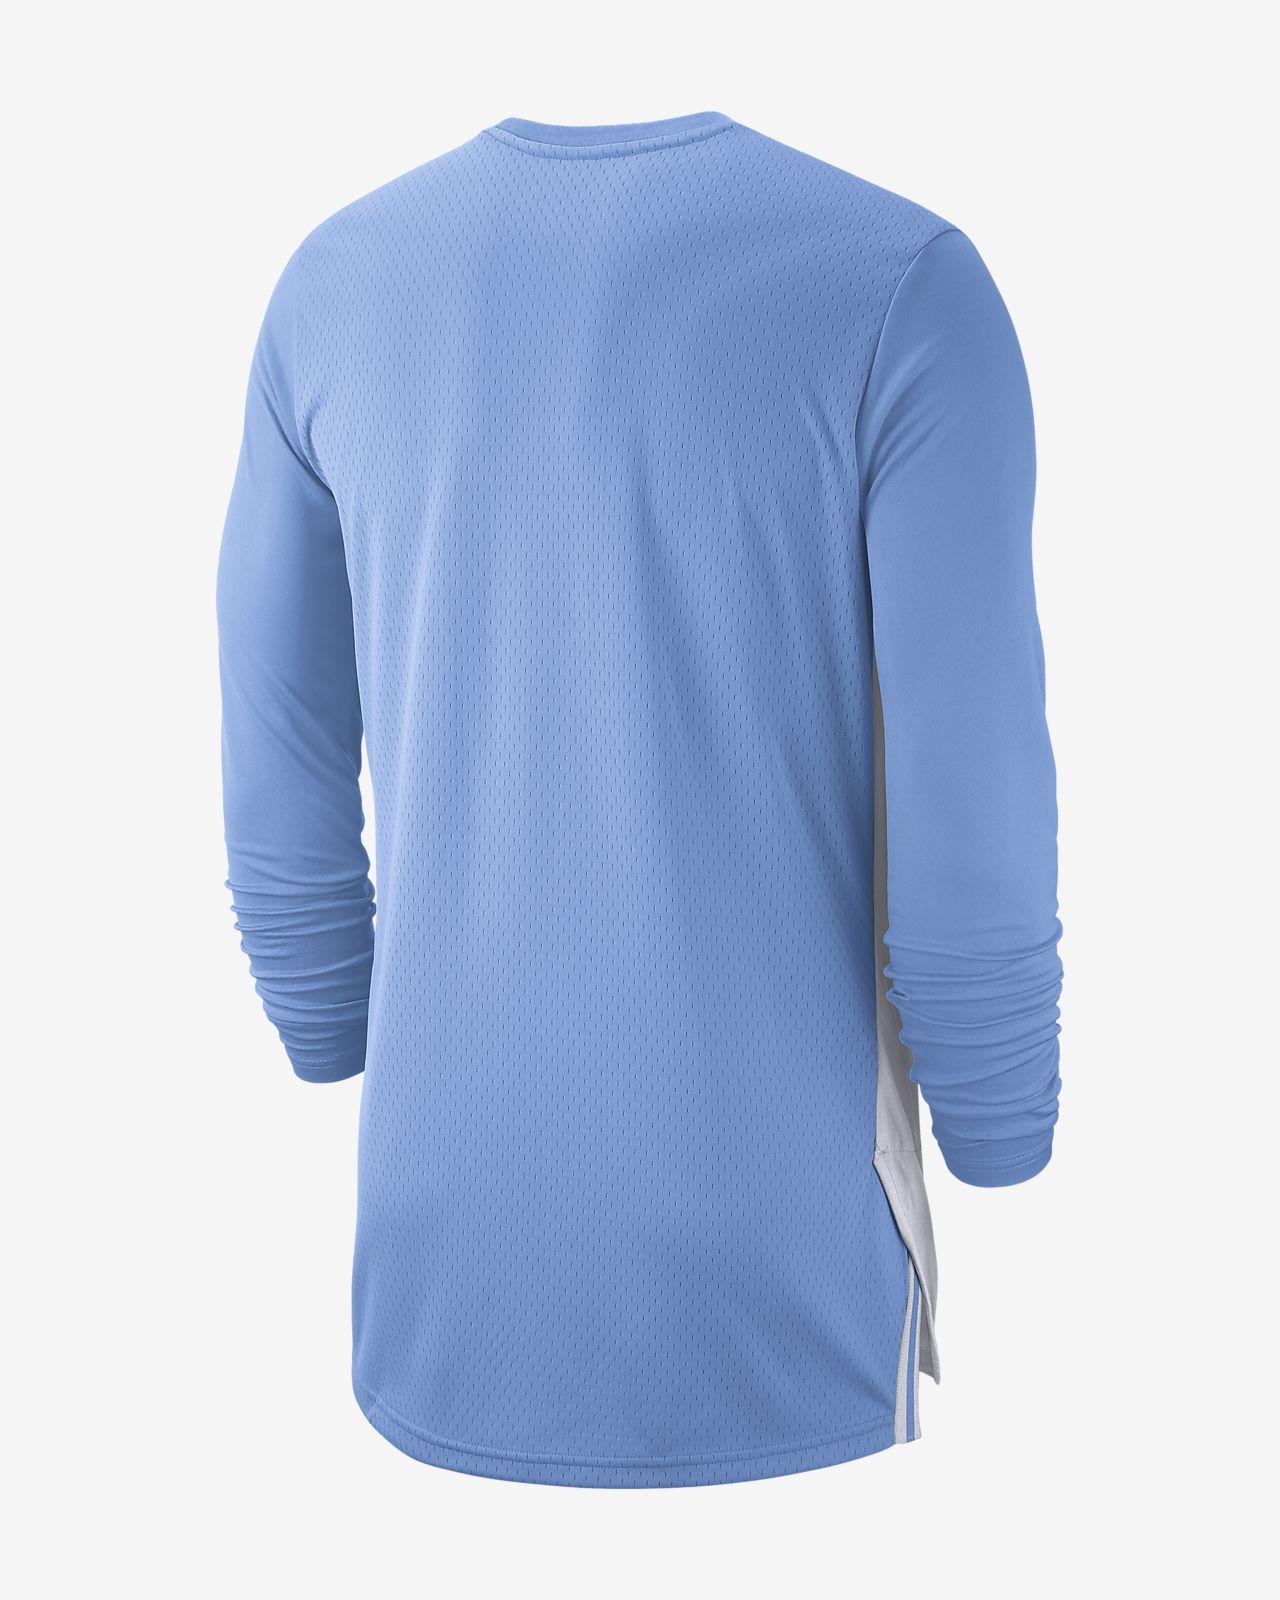 a1be4ea7612b Jordan College Dri-FIT (UNC) Men s Long-Sleeve Basketball Top. Nike.com